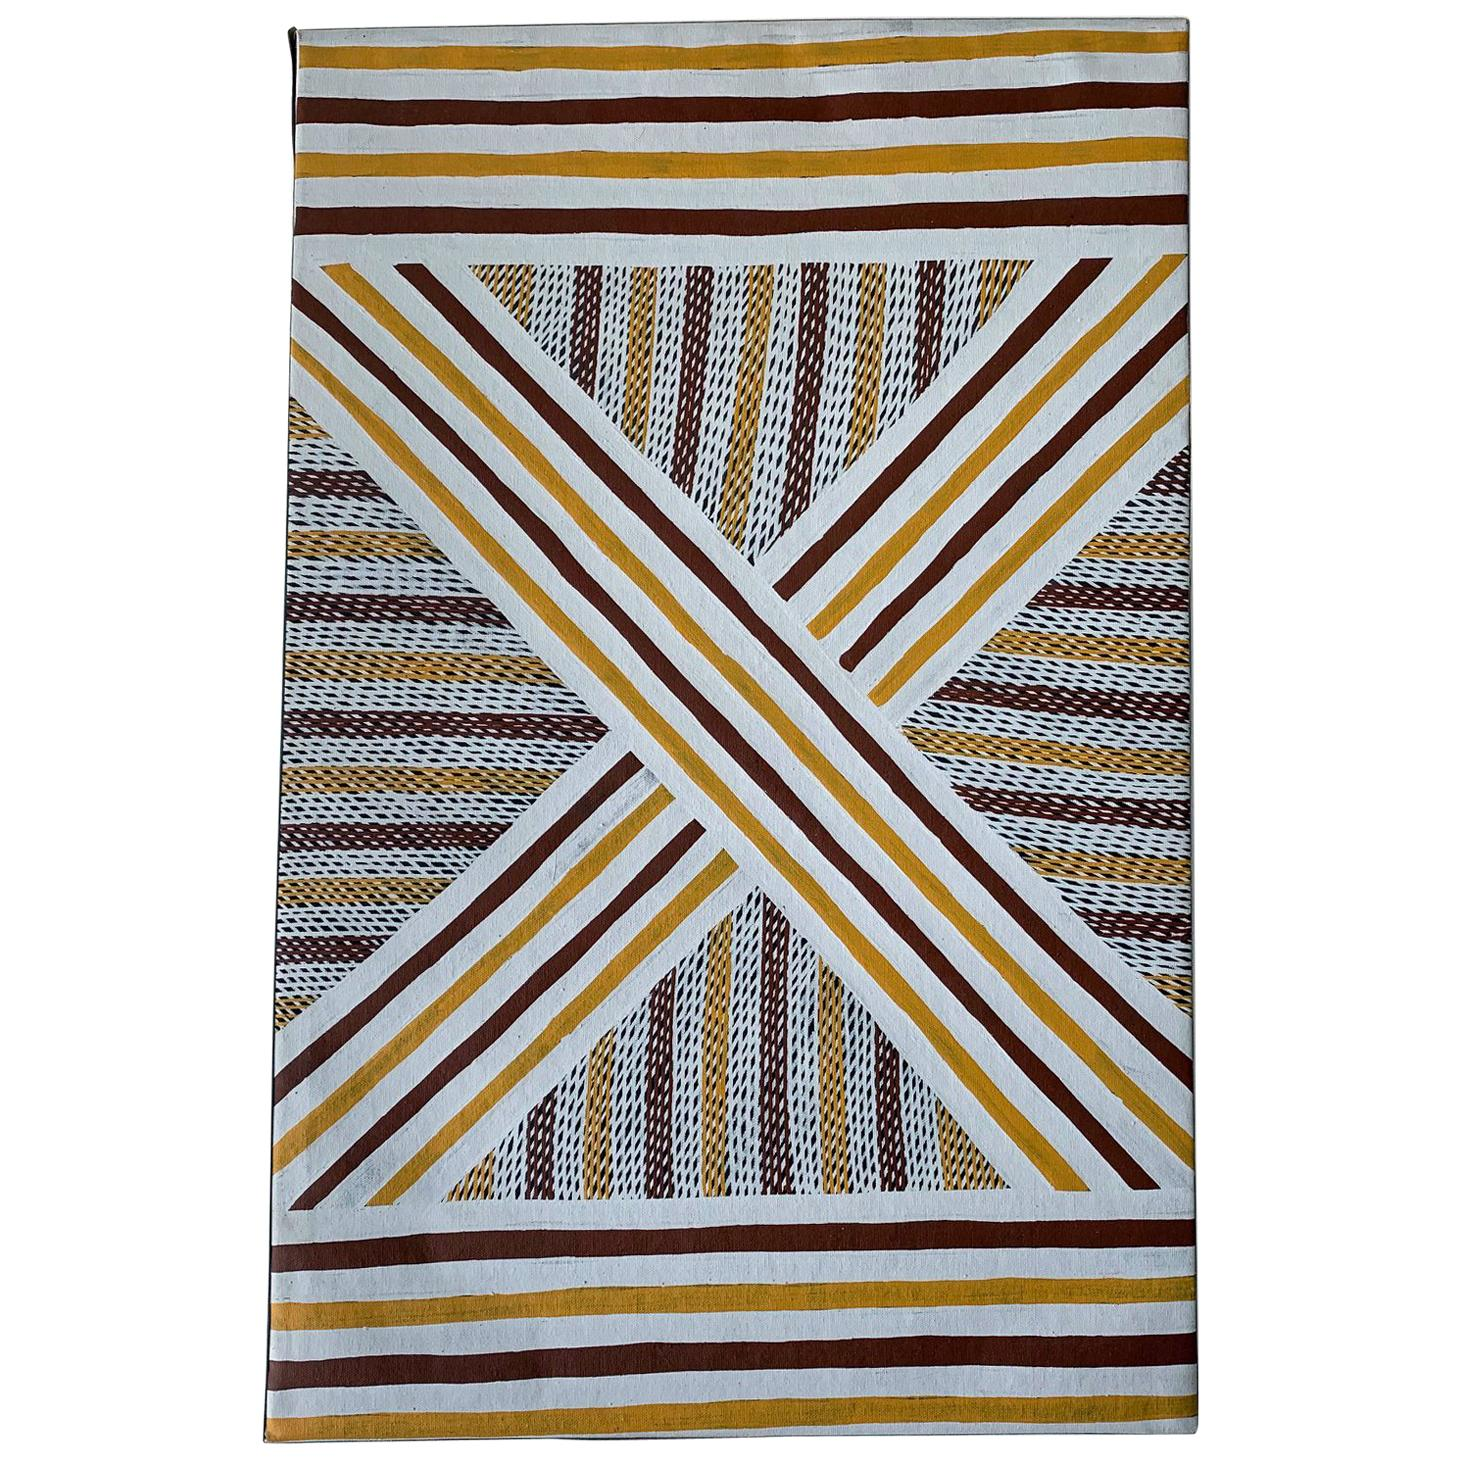 An Australian Aboriginal Painting from Elcho Island